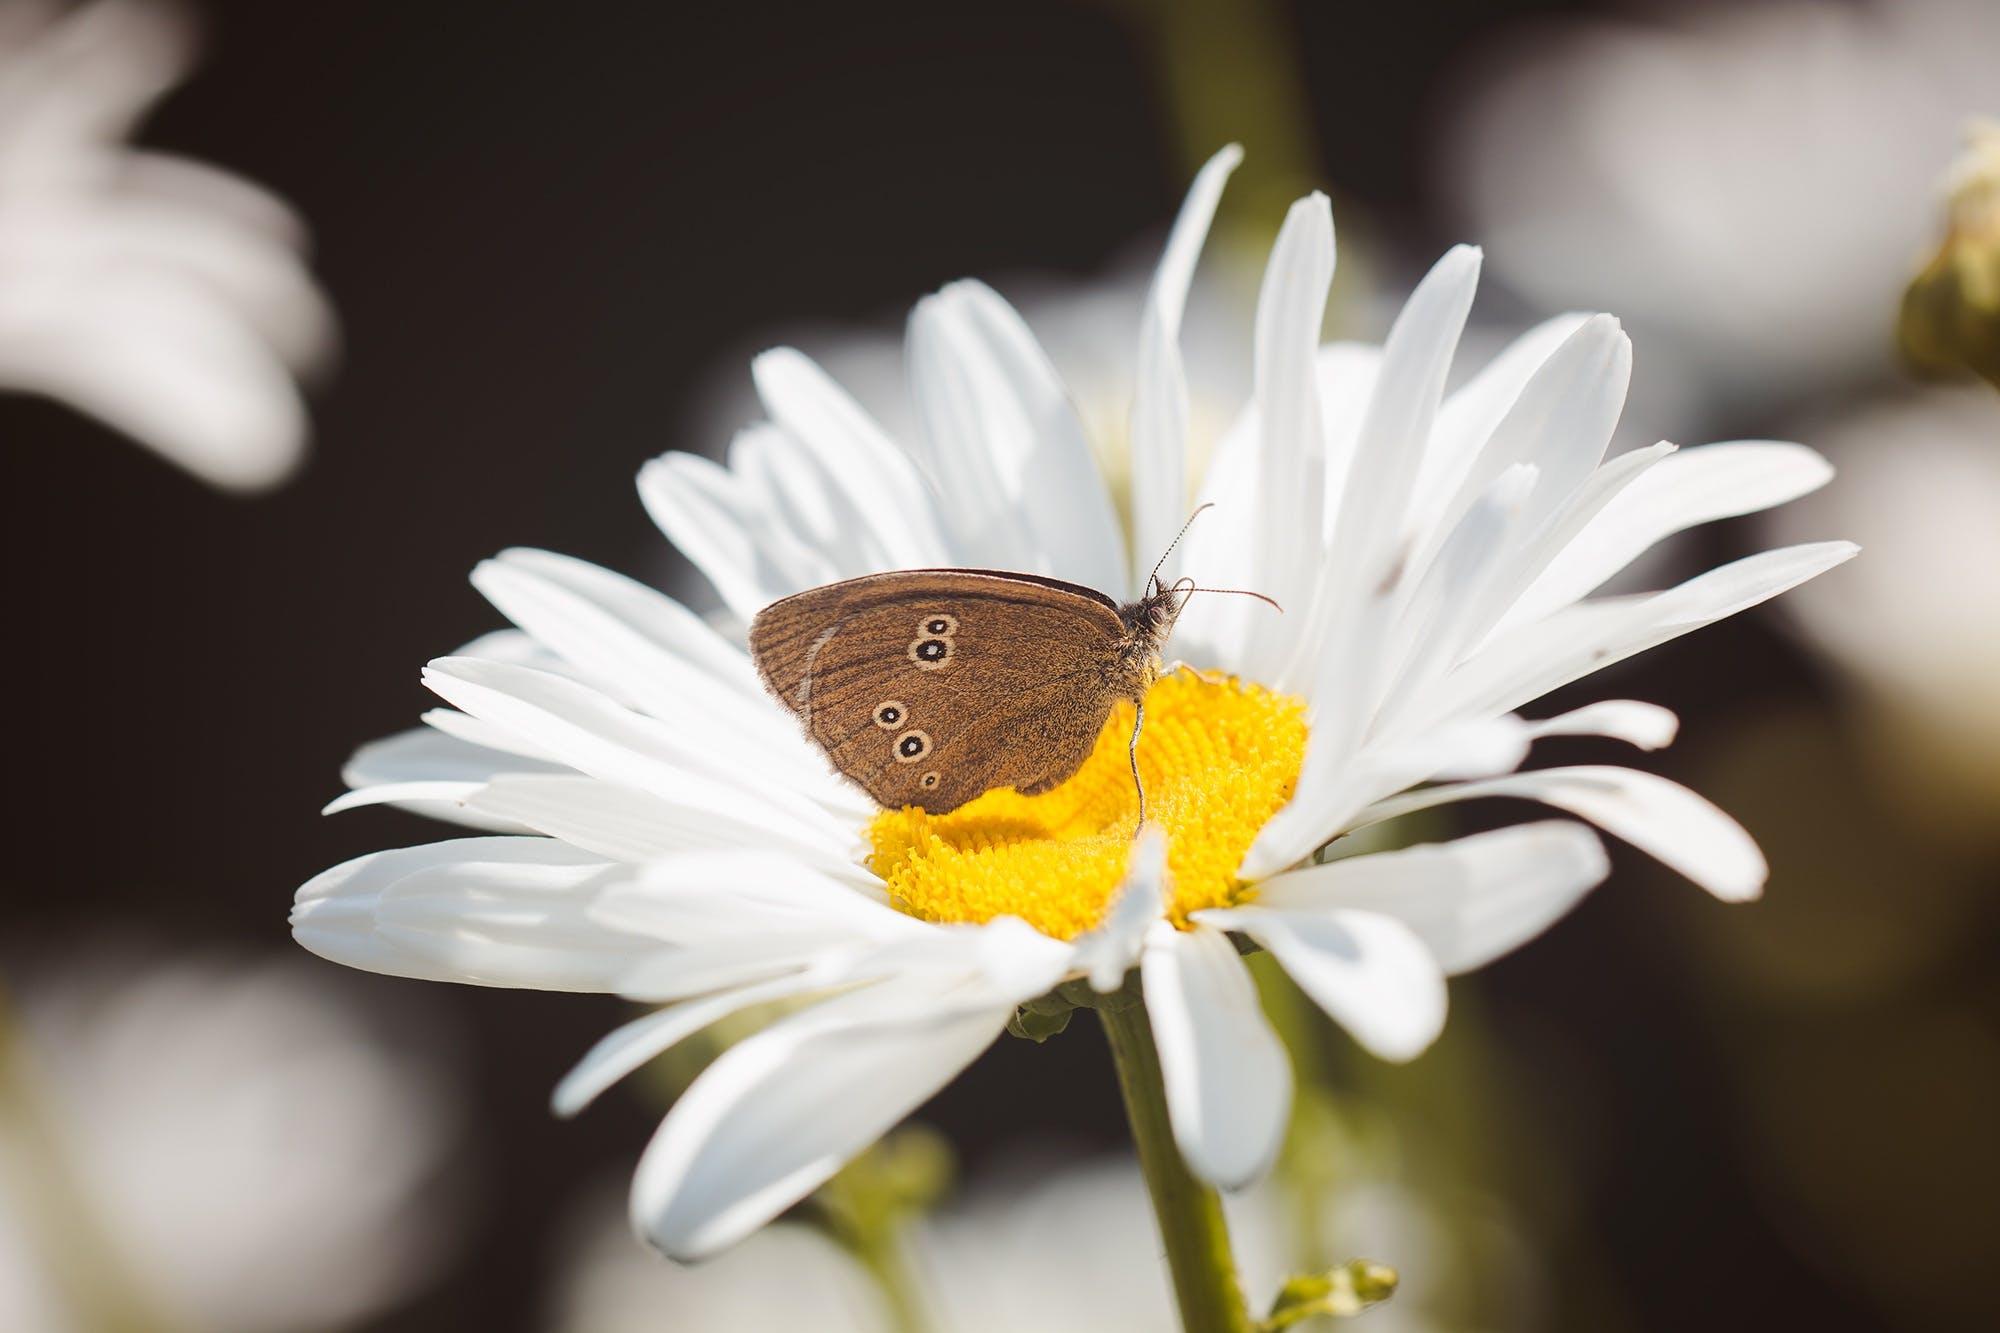 Free stock photo of summer, garden, animal, pollen